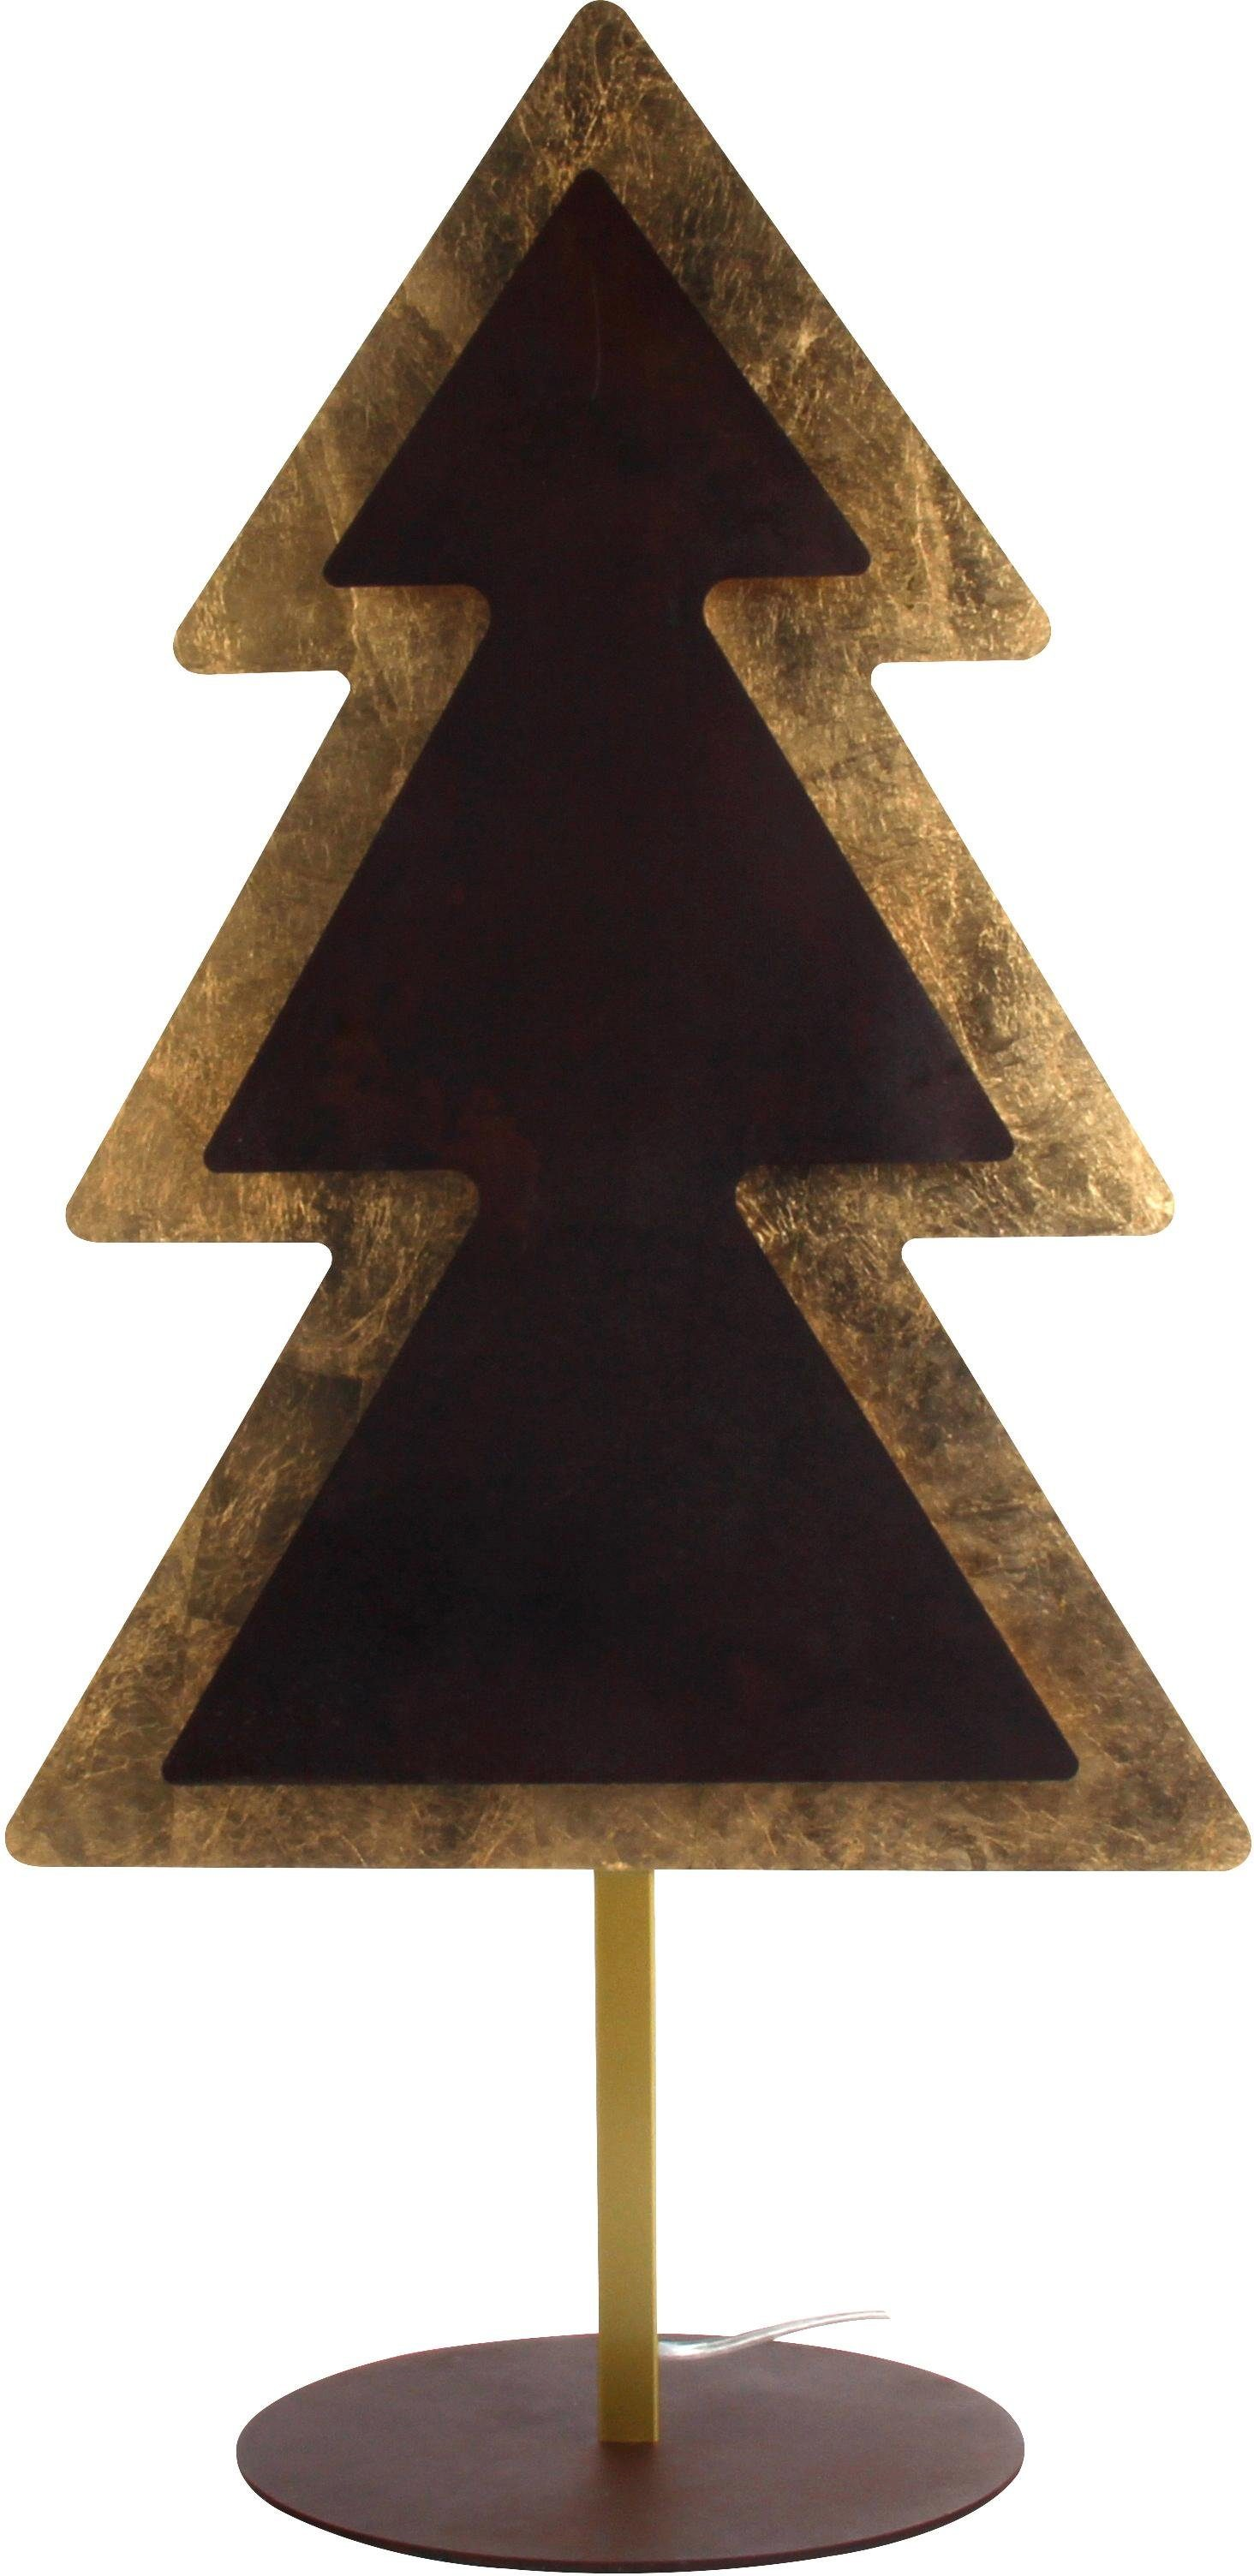 WOFI Tischleuchte MEALLA, LED-Board, Warmweiß